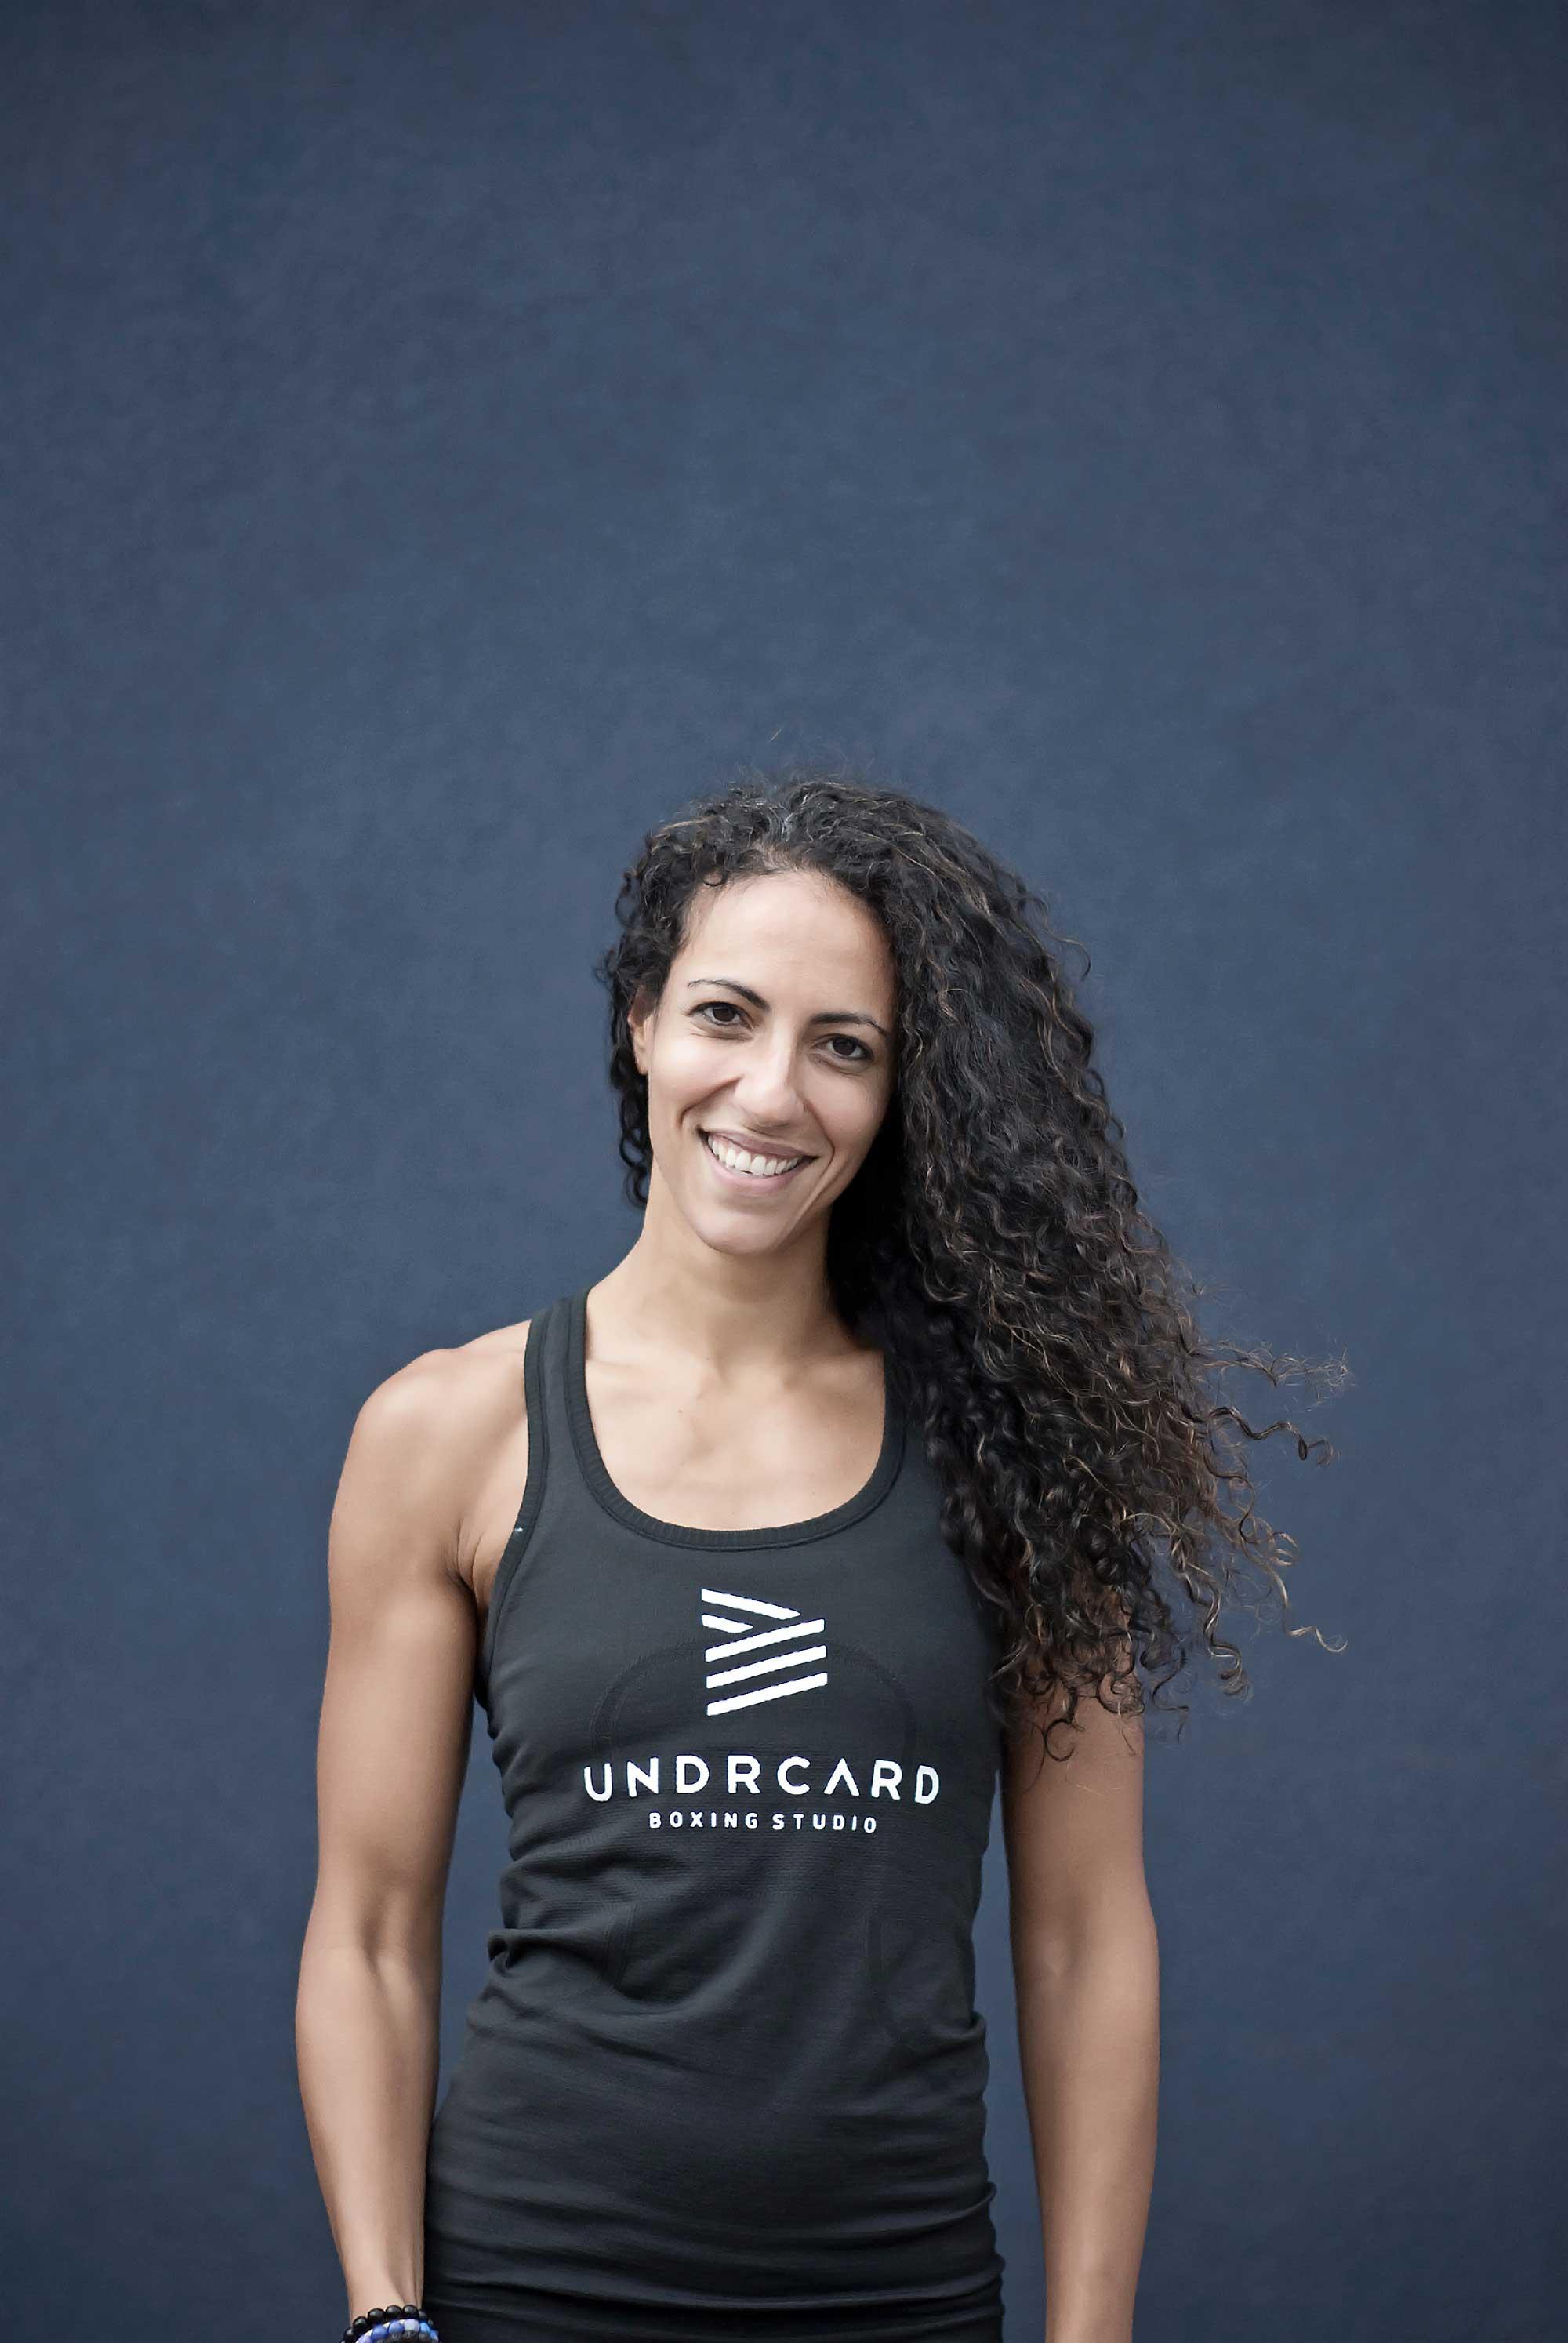 blog_UNDRCARD_boxing_studio_Calgary_undercard_Calgarys_boxing_classes_fitness_shaima_2